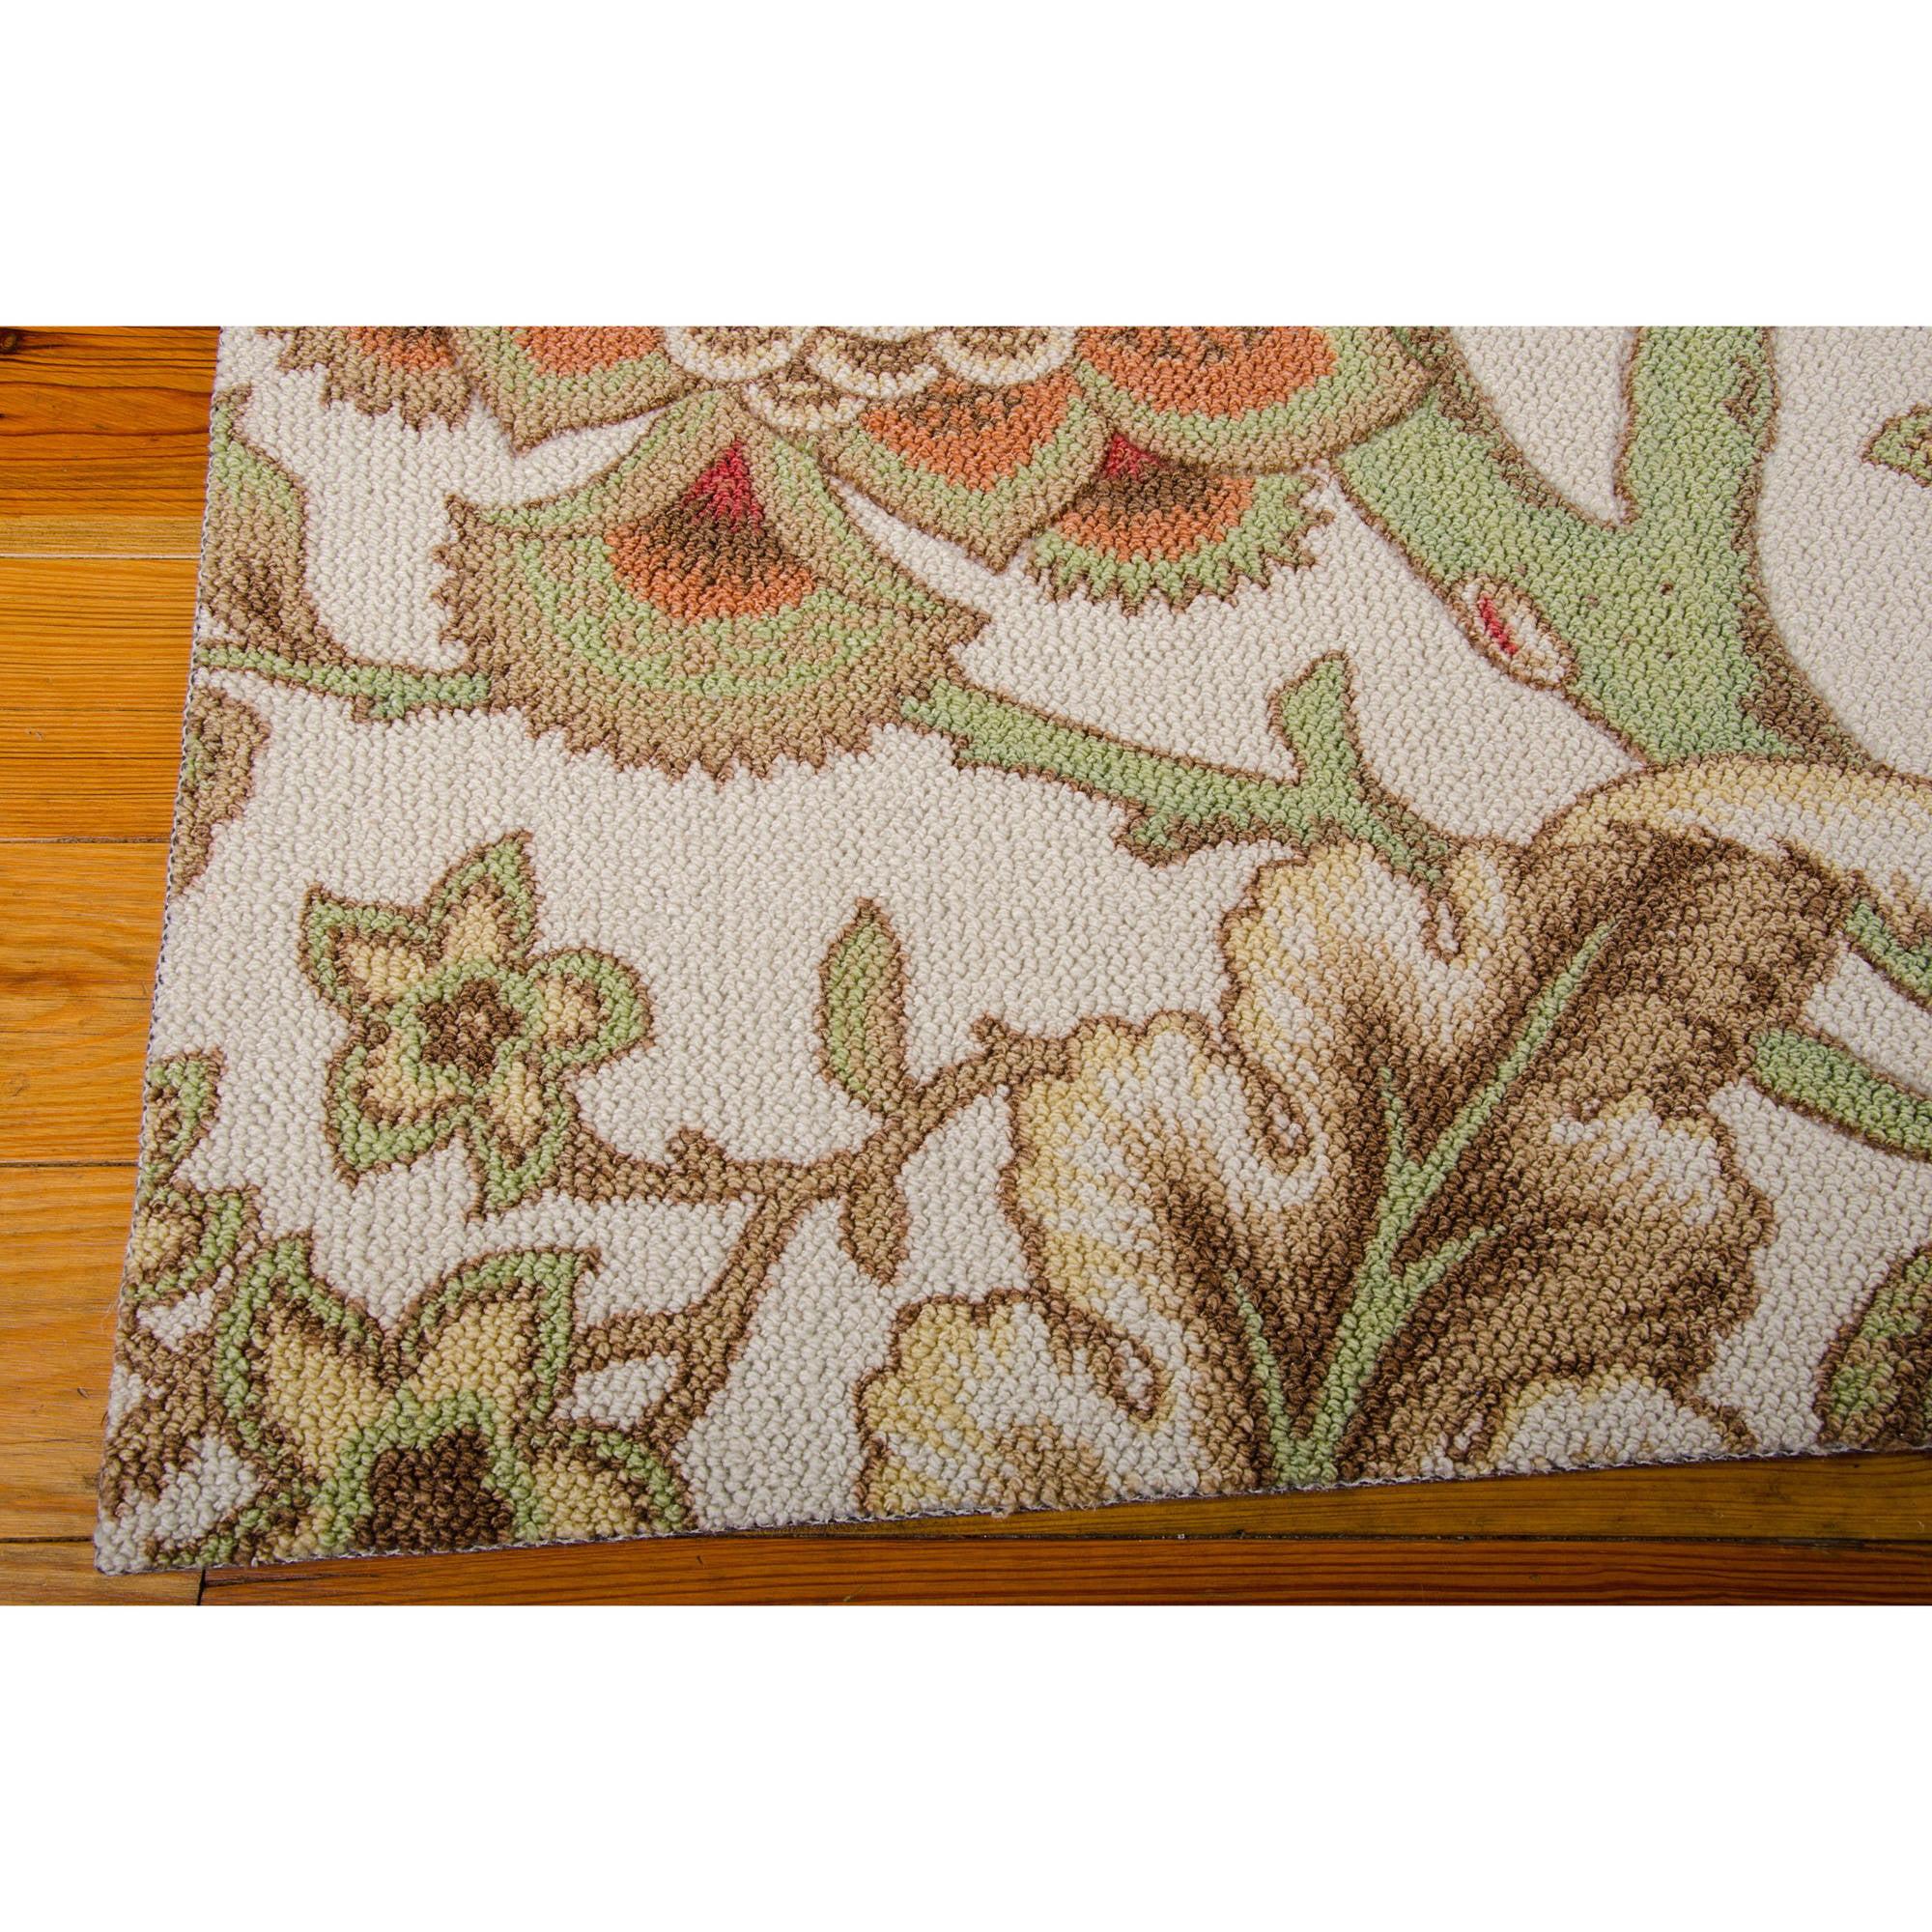 waverly rugs - nourison waverly global awakening imperial dress polyester rug